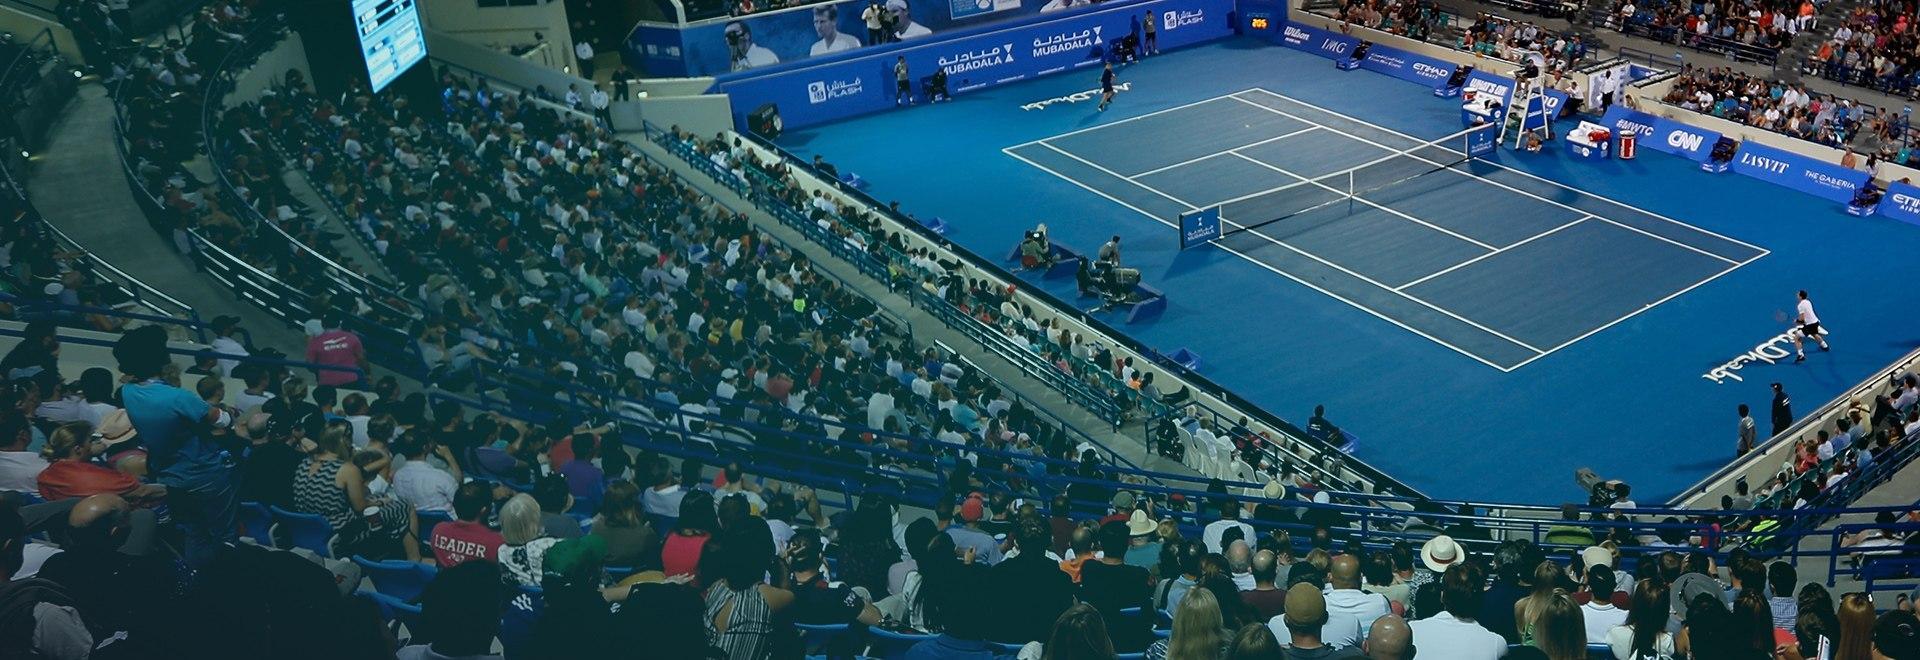 Djokovic - Khachanov. Finale 3° posto M